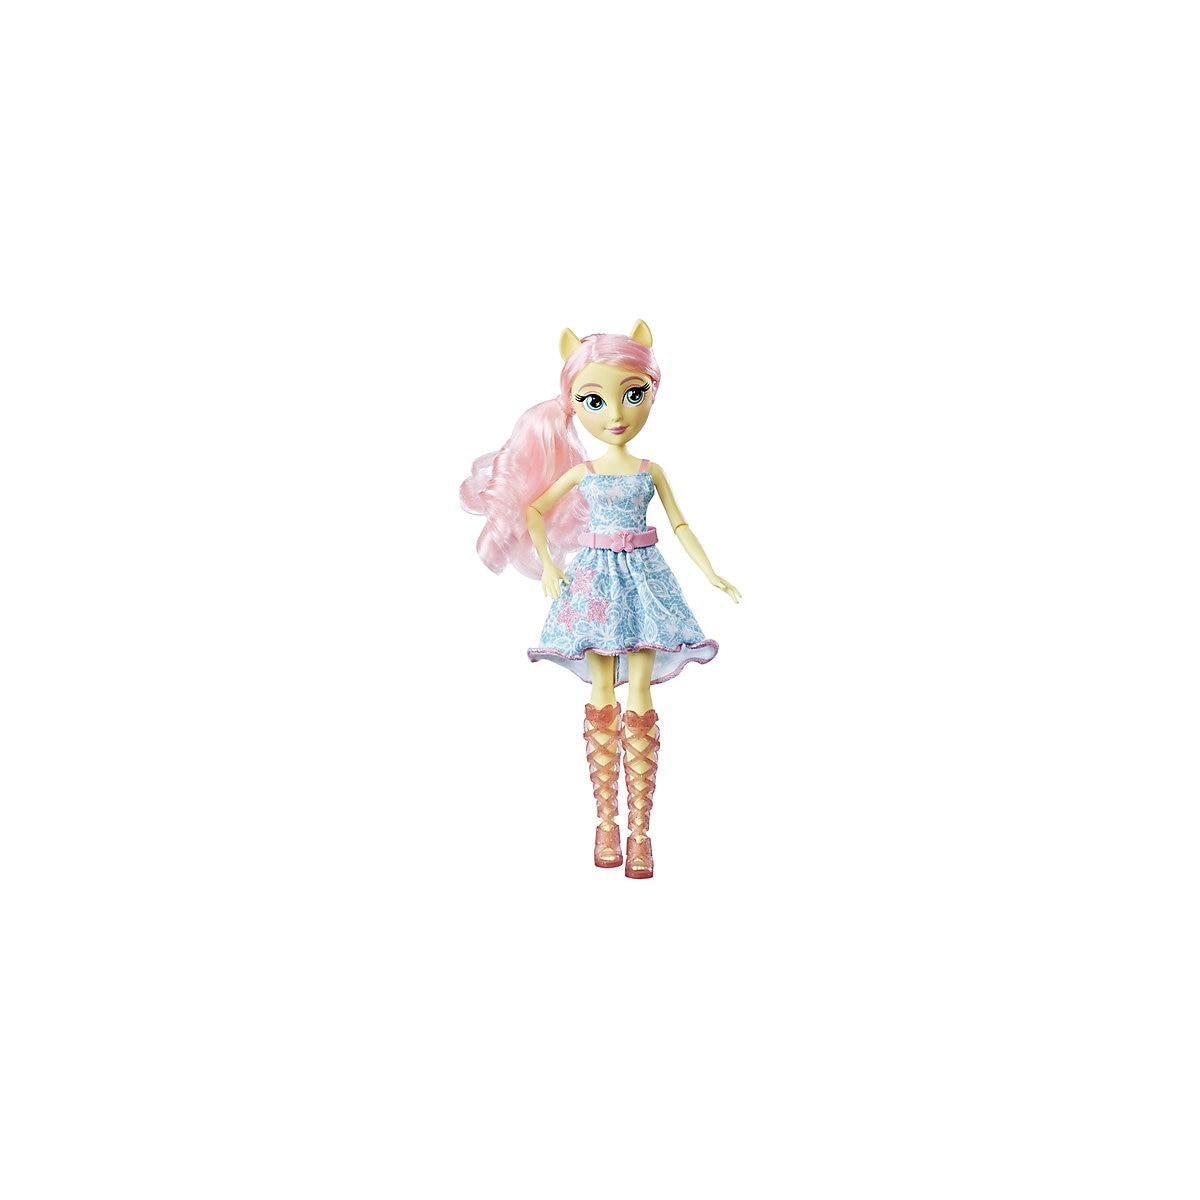 HASBRO muñecas 9170539 niñas juguetes para niños niñas juguete moda muñeca juego accesorios niños novia MTpromo